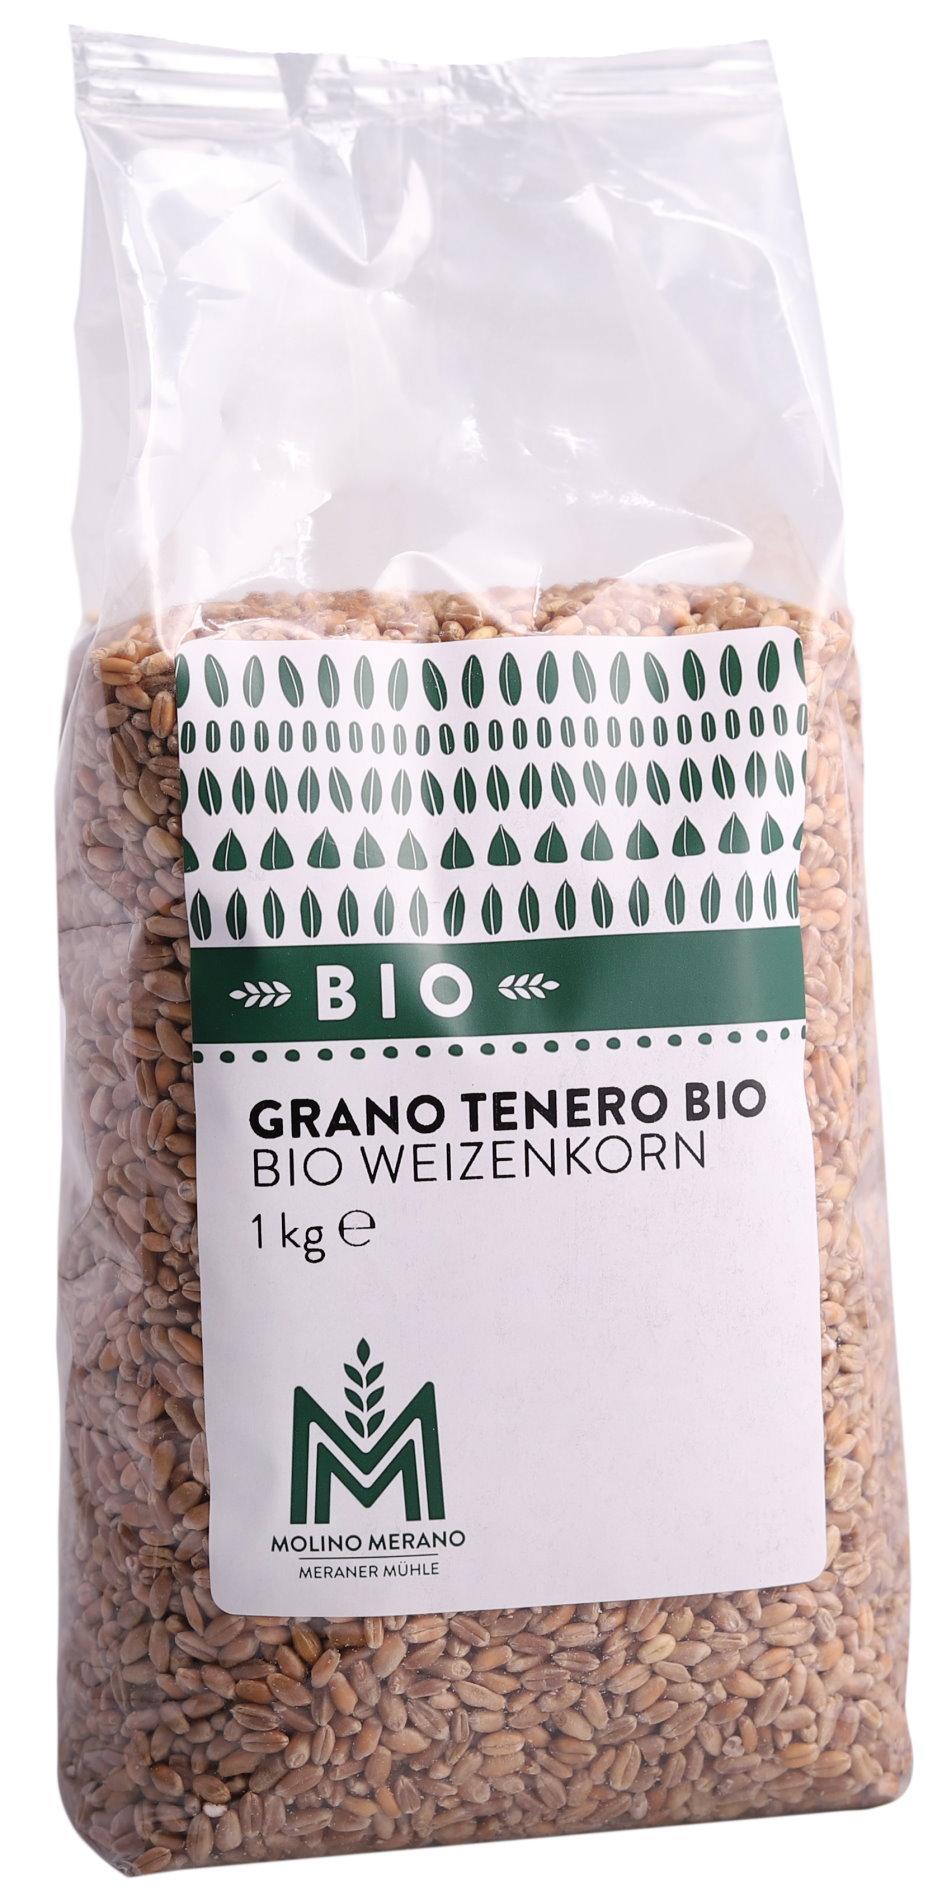 Organic wheat grain